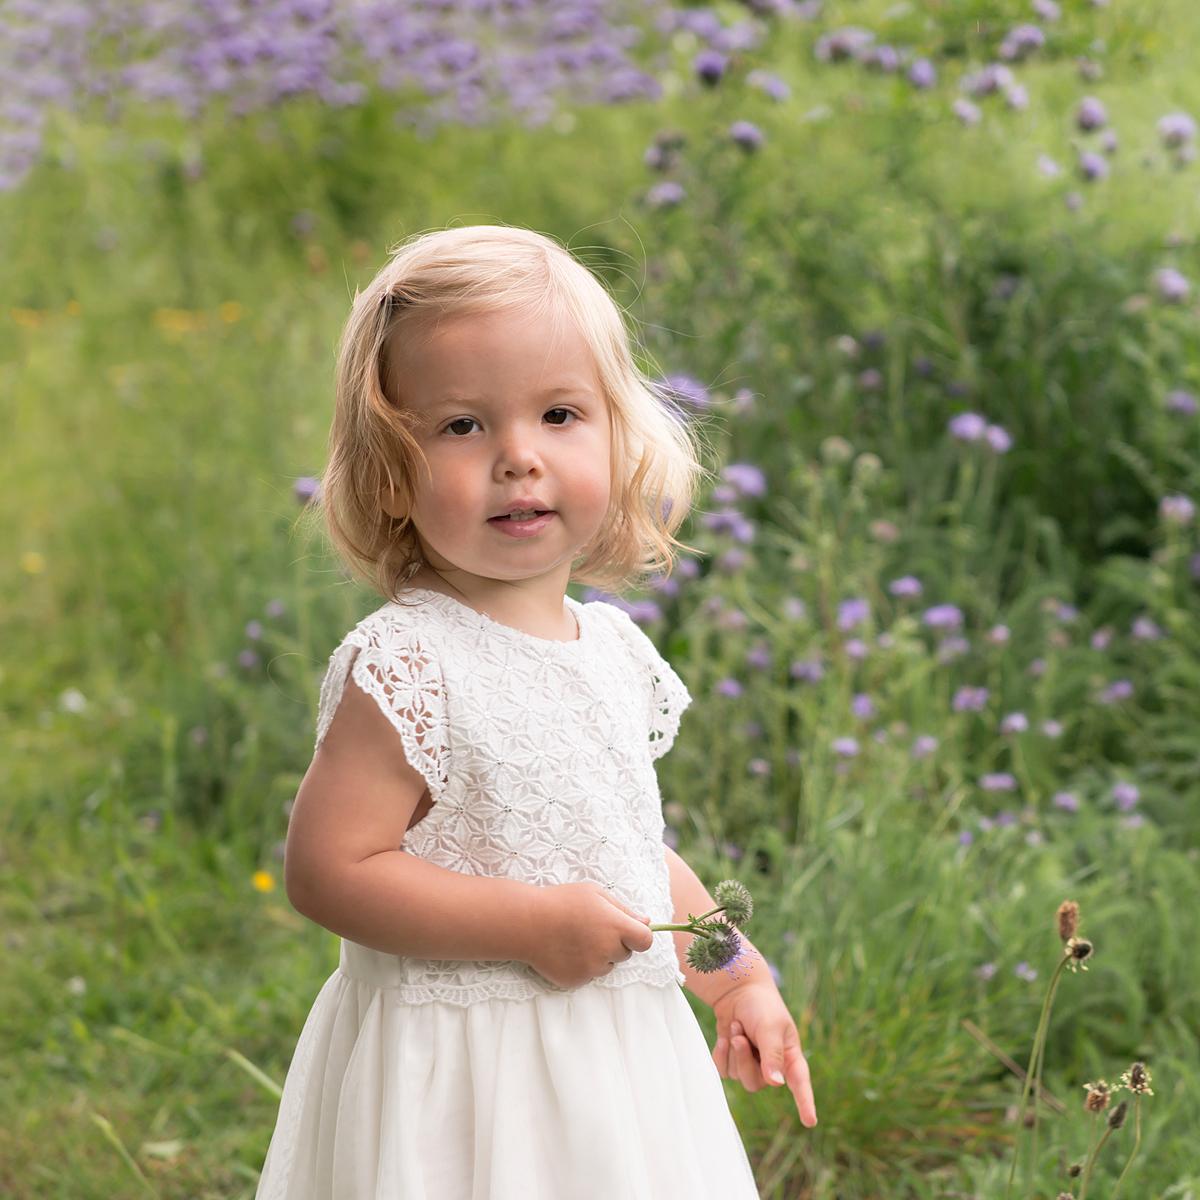 Little girl holds a flower in a field of wildflowers in Crane Park